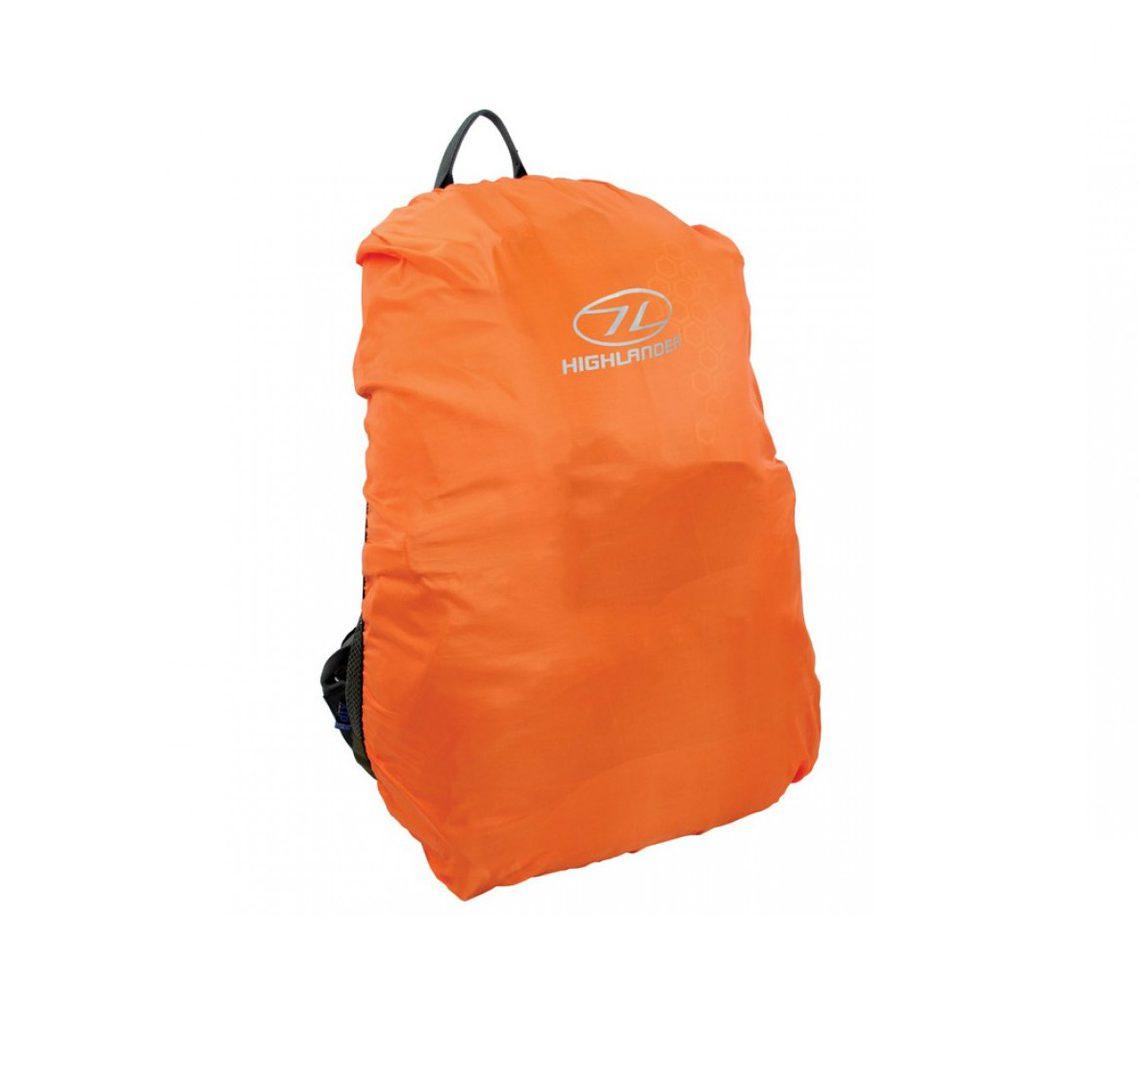 Highlander Medium Rucksack Cover - Orange